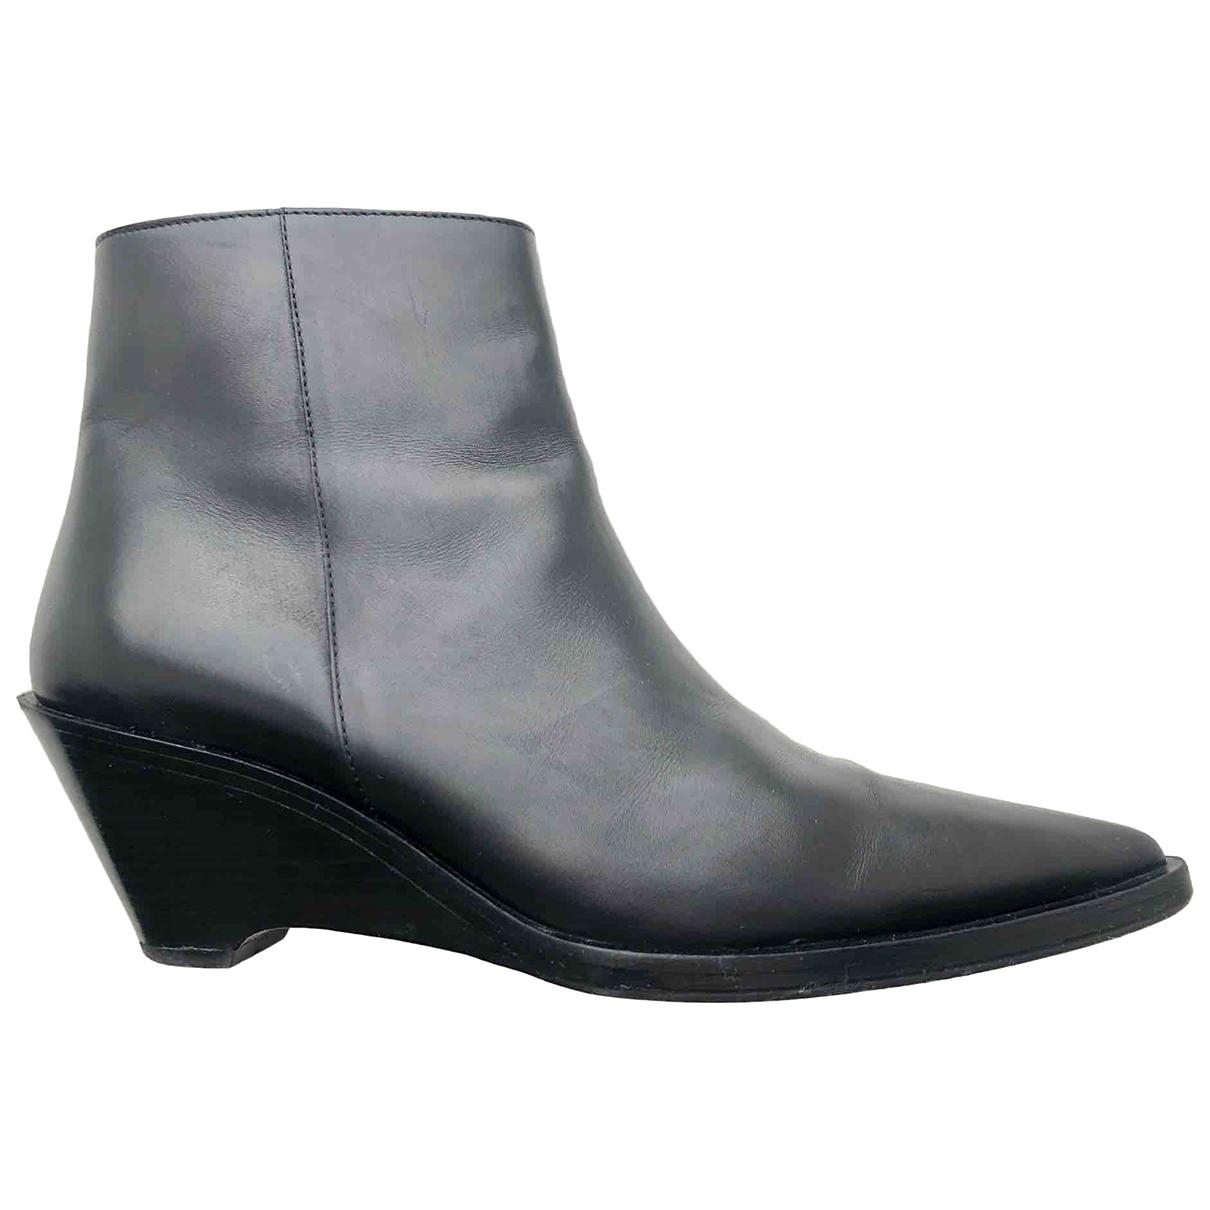 Acne Studios N Black Leather Boots for Women 39 EU